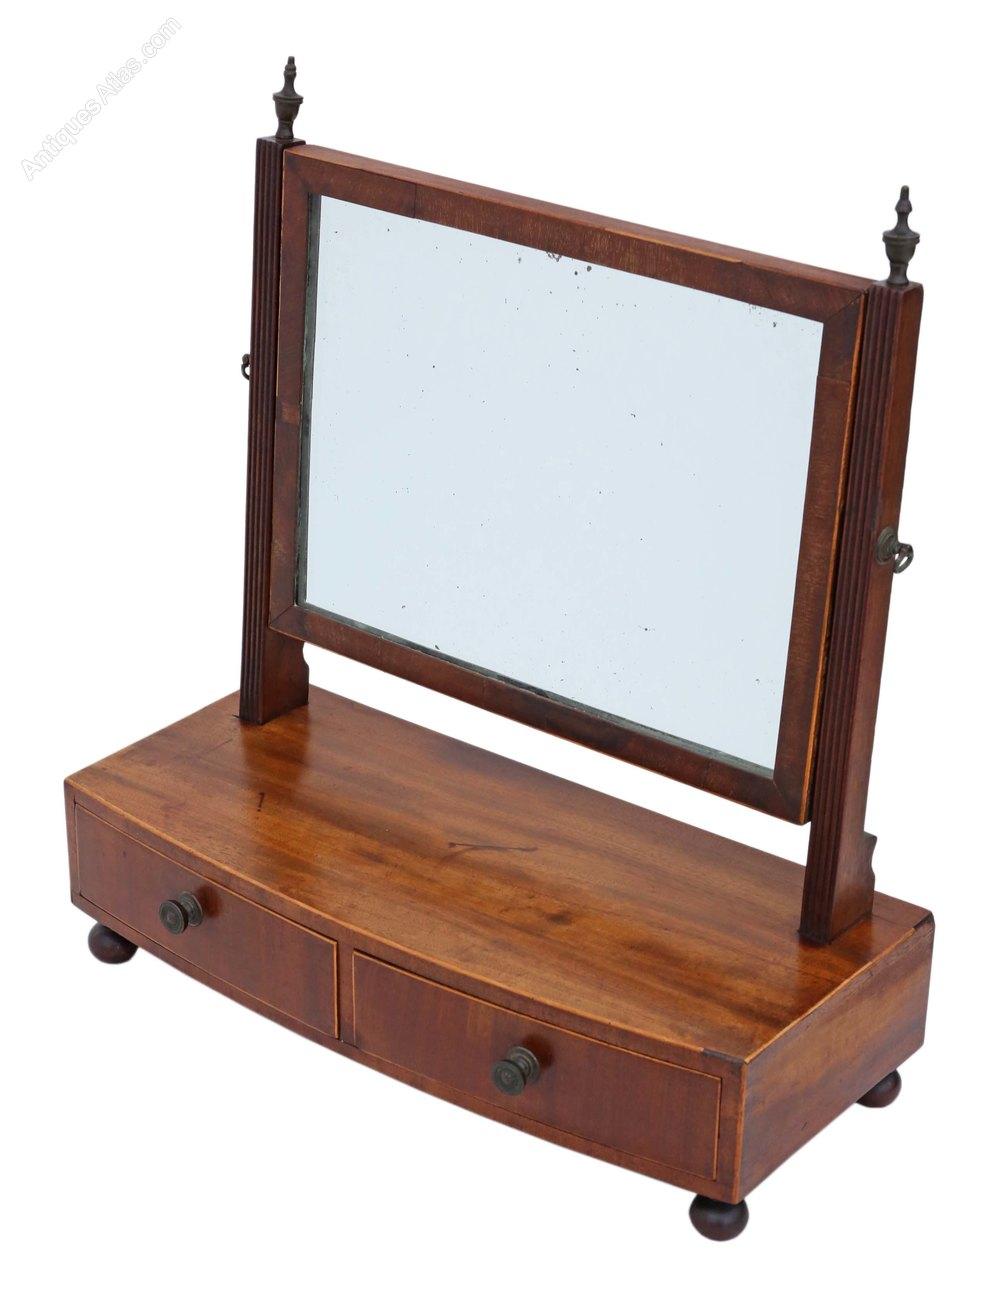 Antiques atlas regency c1825 mahogany swing dressing for Dressing table mirror